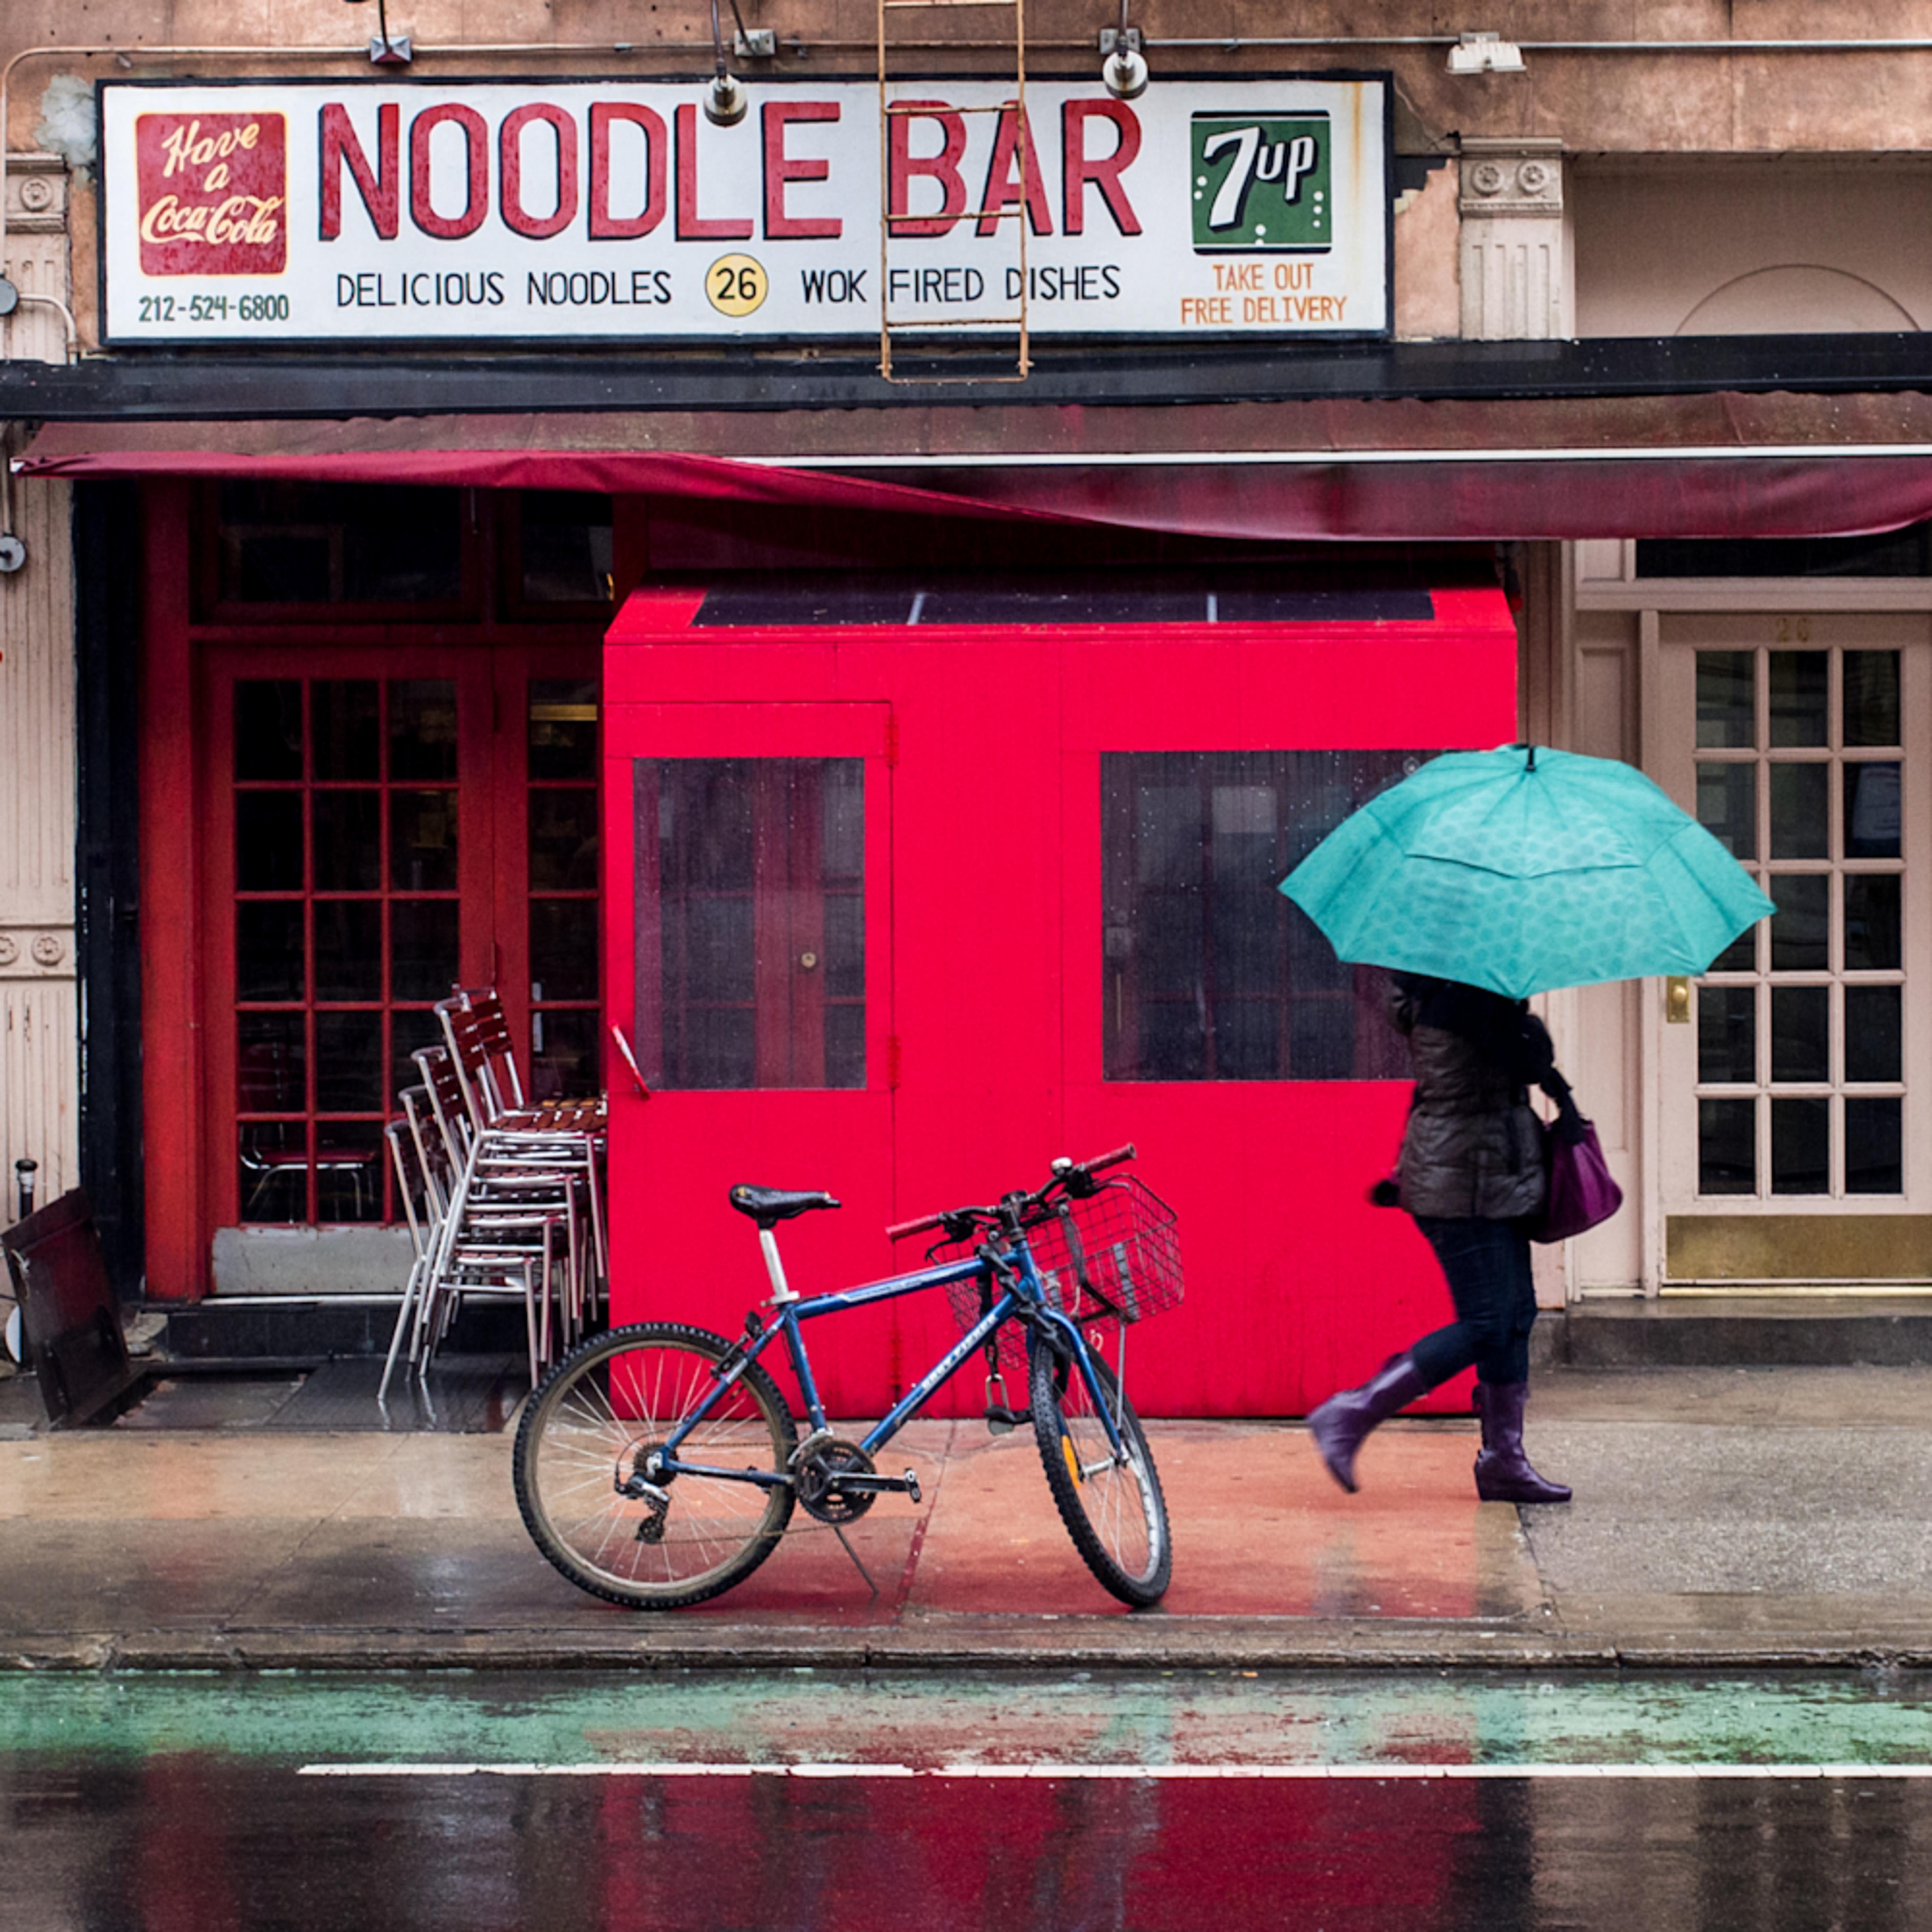 Noodle bar asen0010 ac3ynl